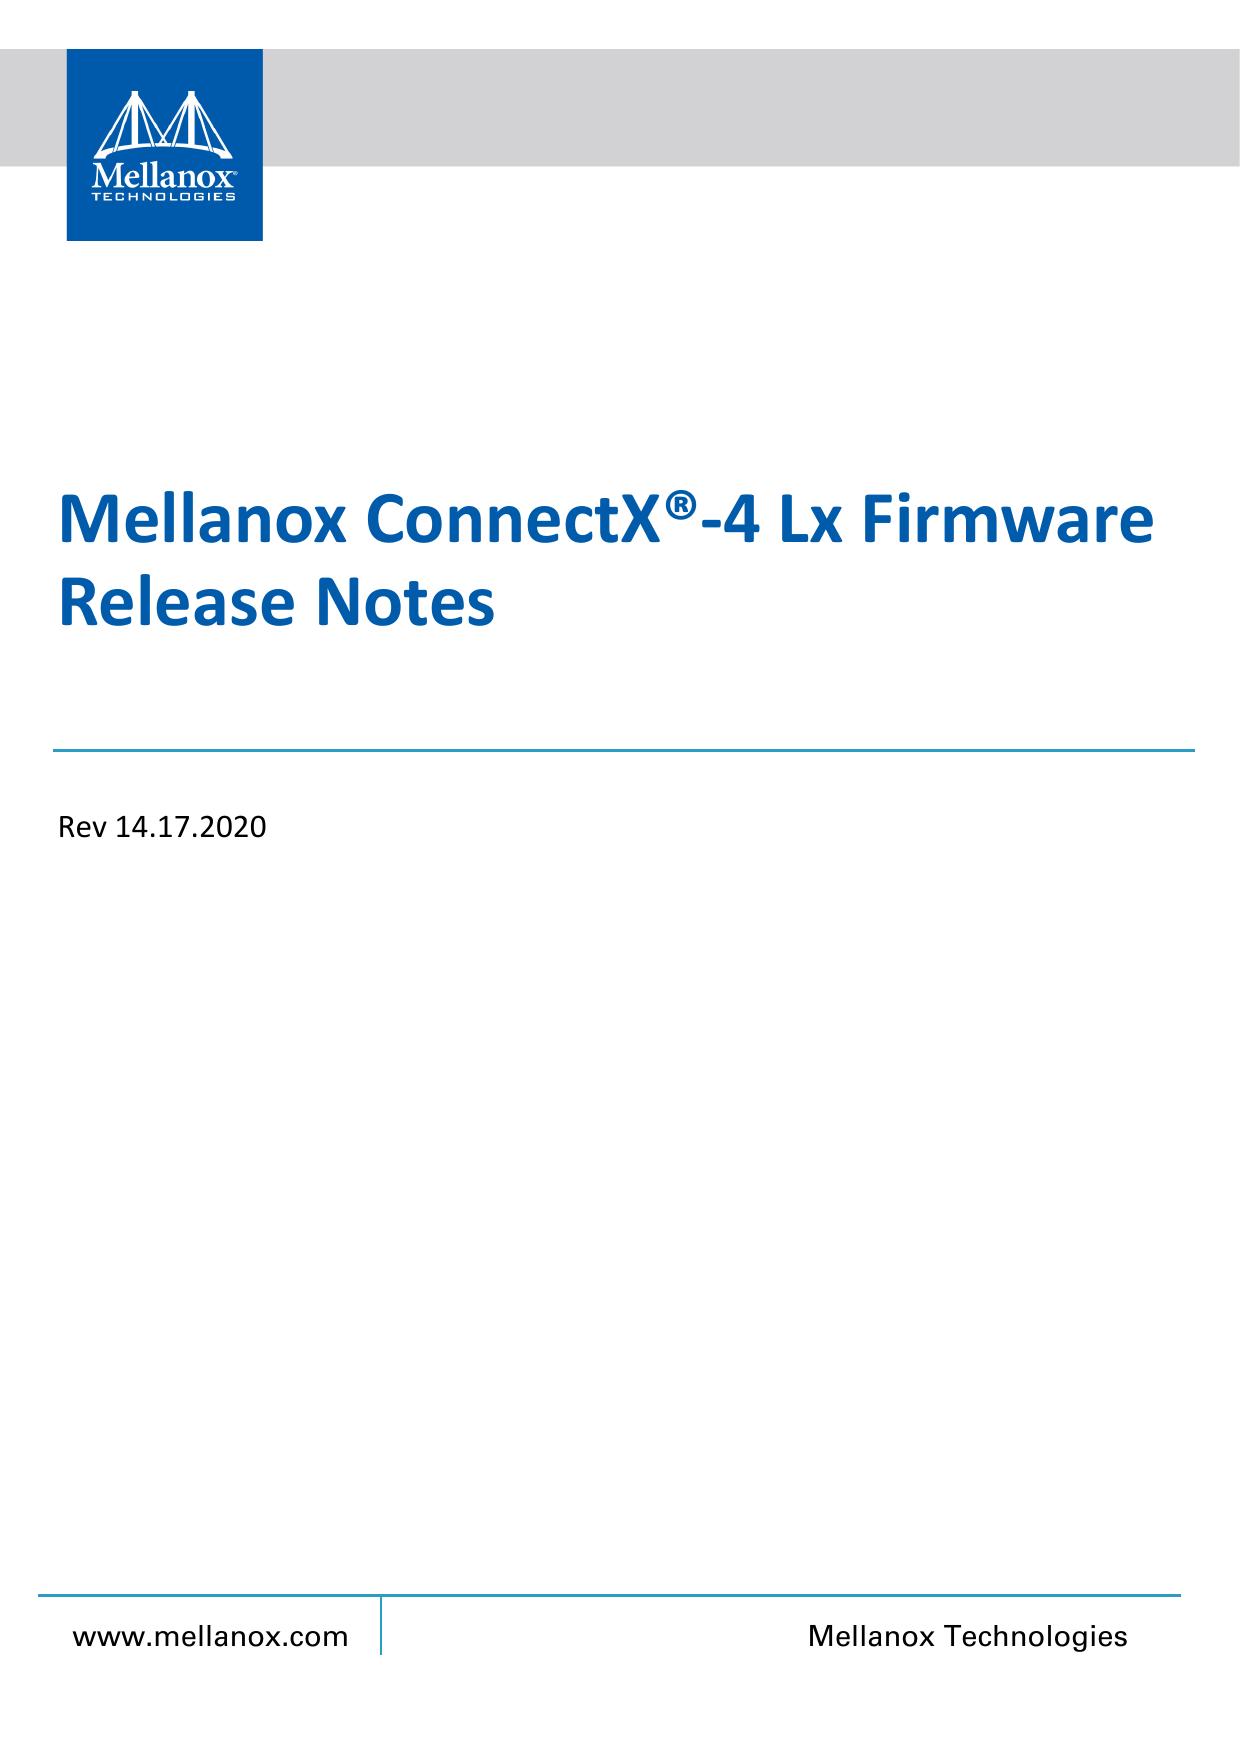 Mellanox ConnectX®-4 Lx Firmware Release Notes | manualzz com